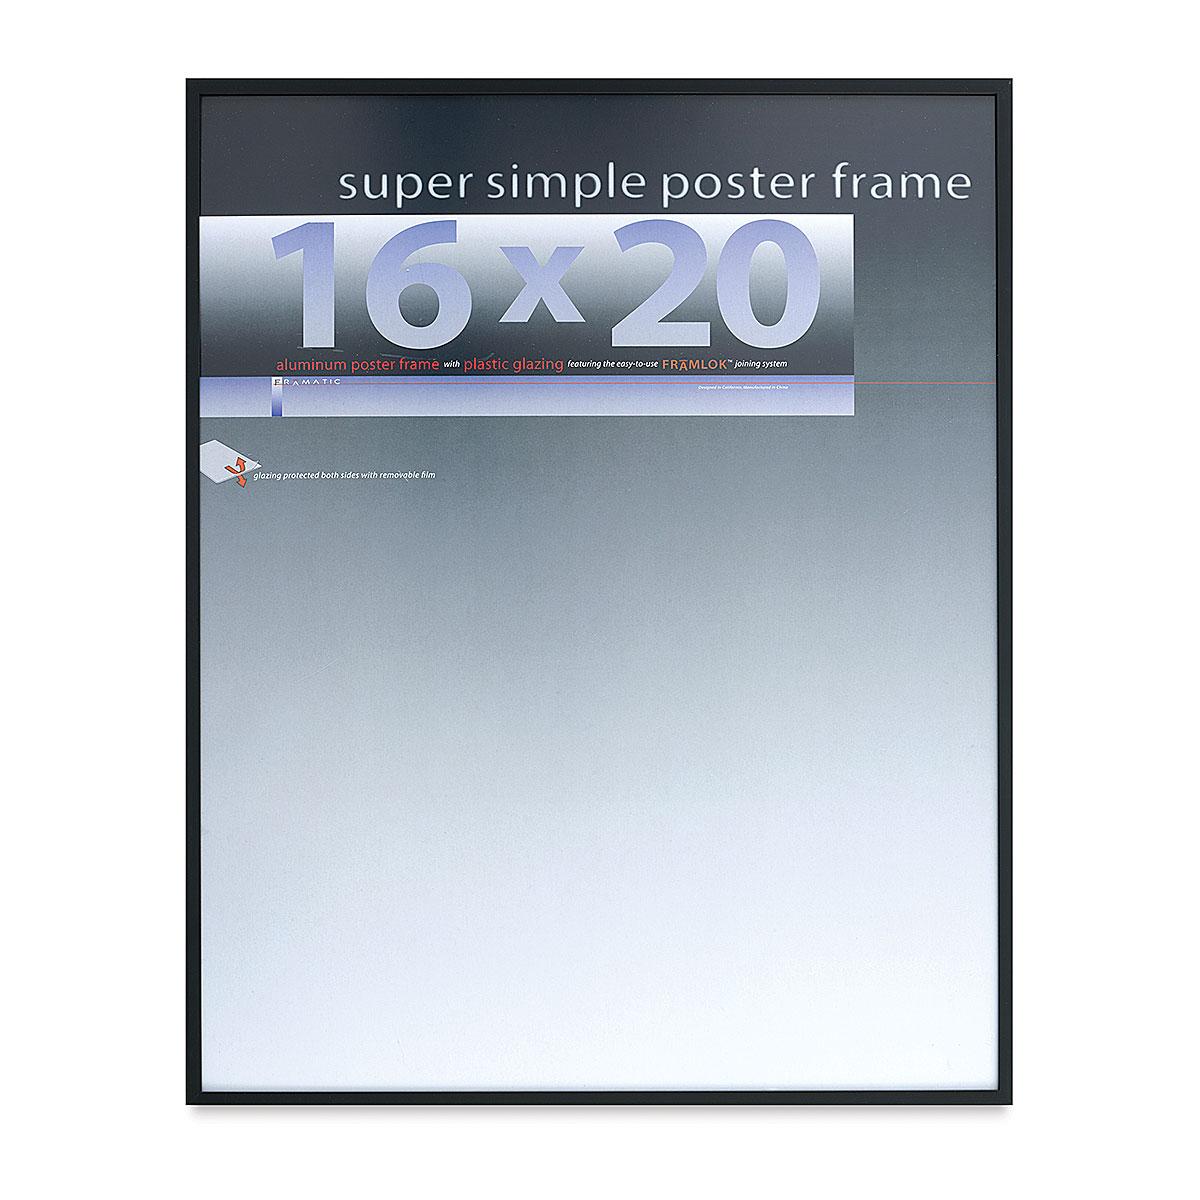 Framatic Super Simple Poster Frame - Black, 16 x 20